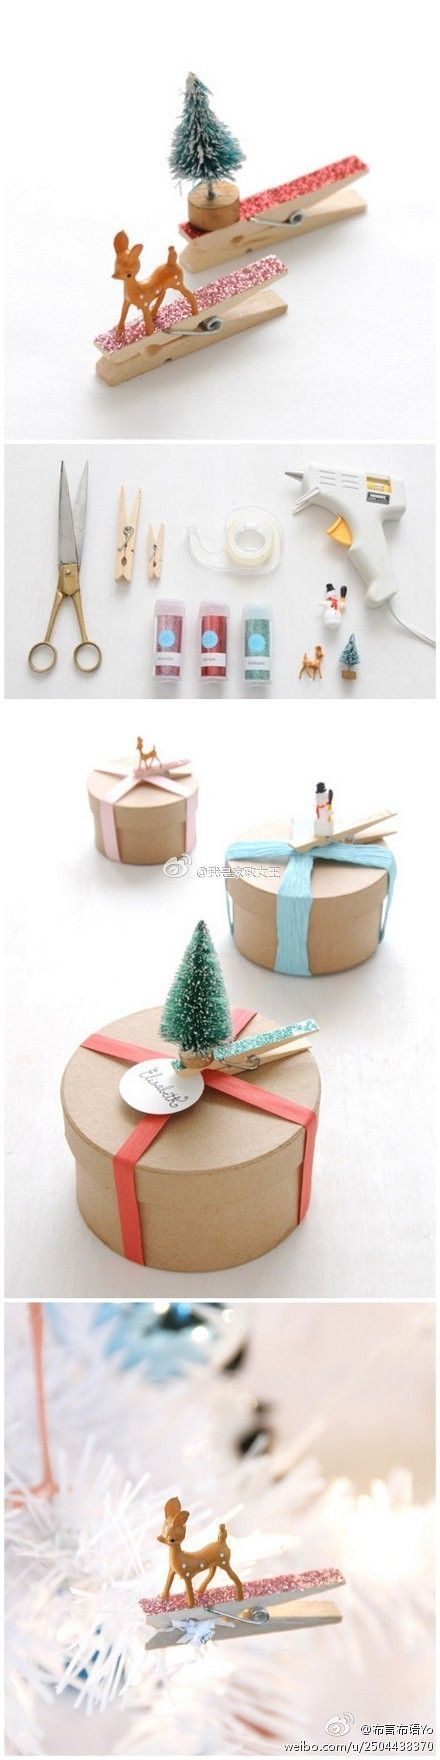 Christmas DIY decorating